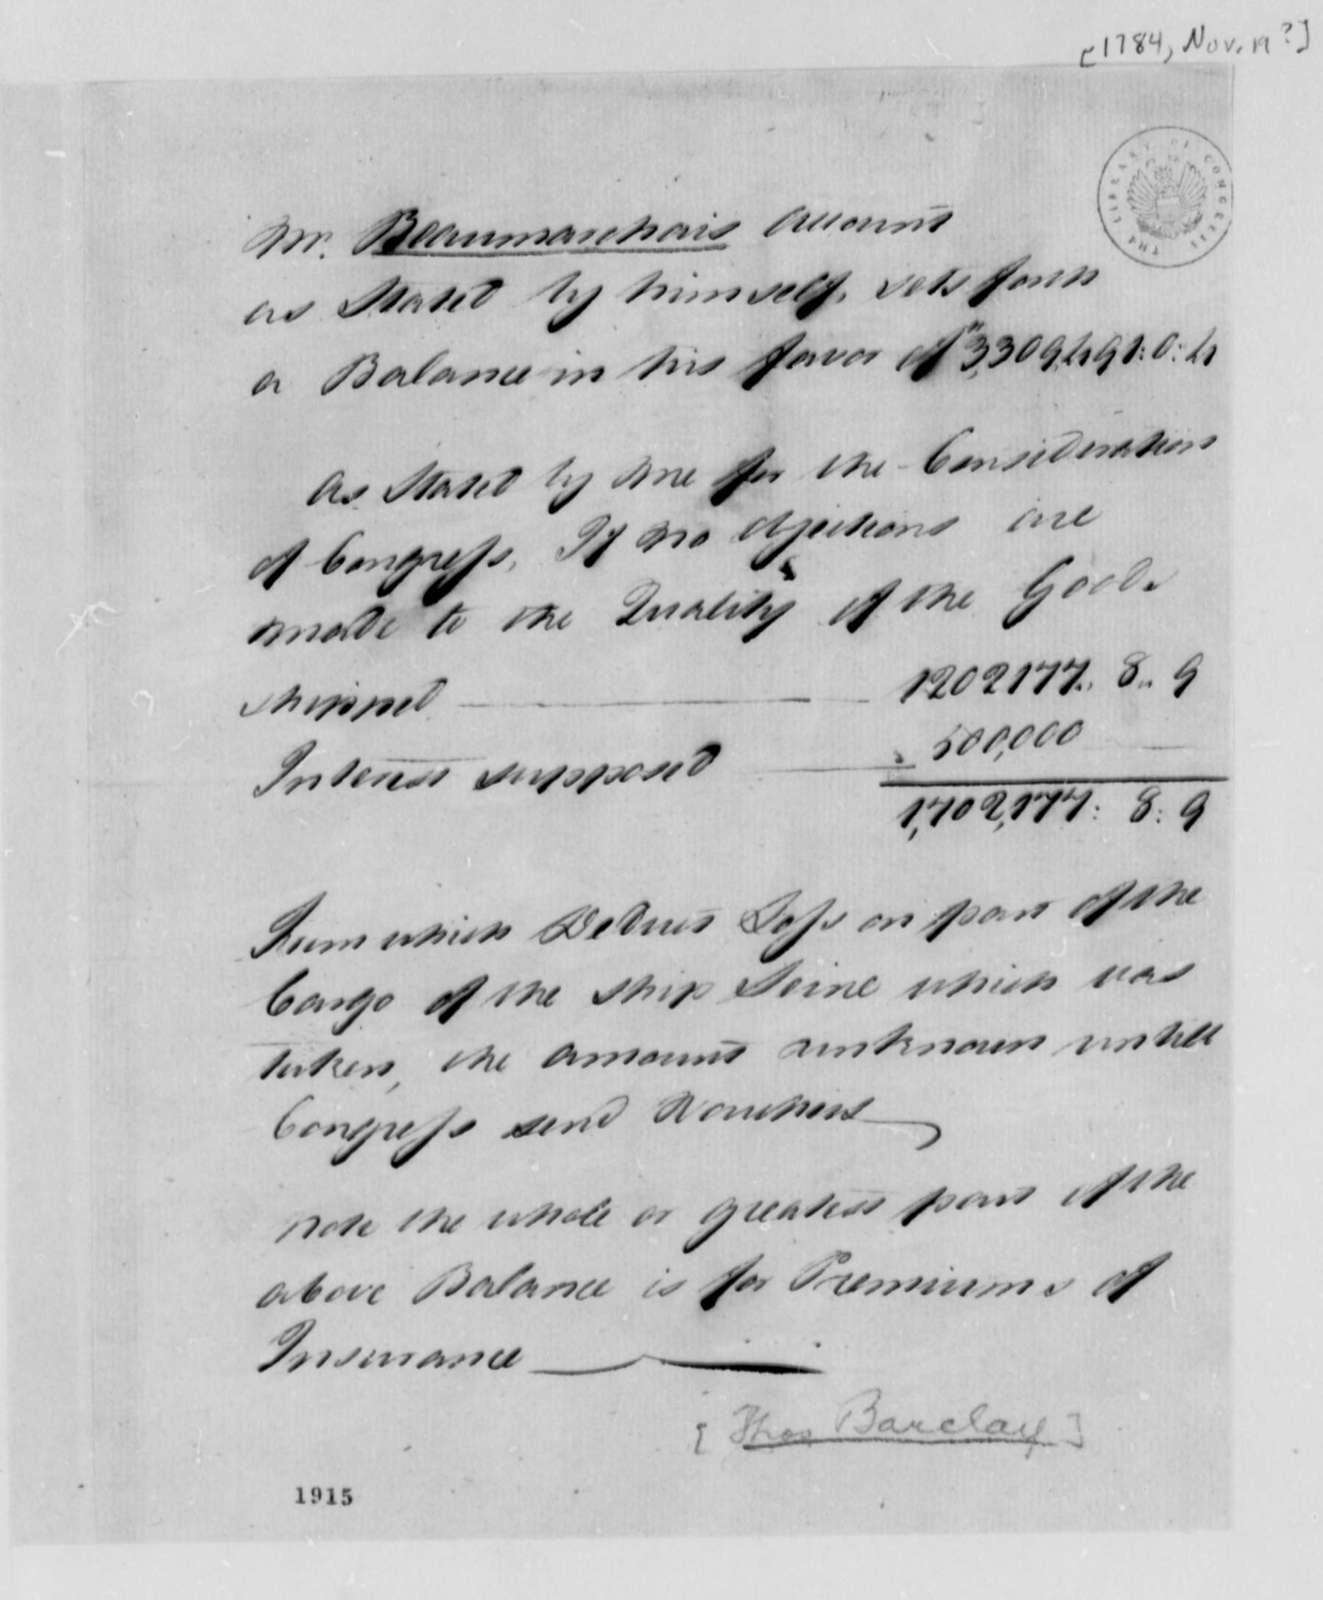 Barclay Thomas to United States Congress, November 19, 1784, Account